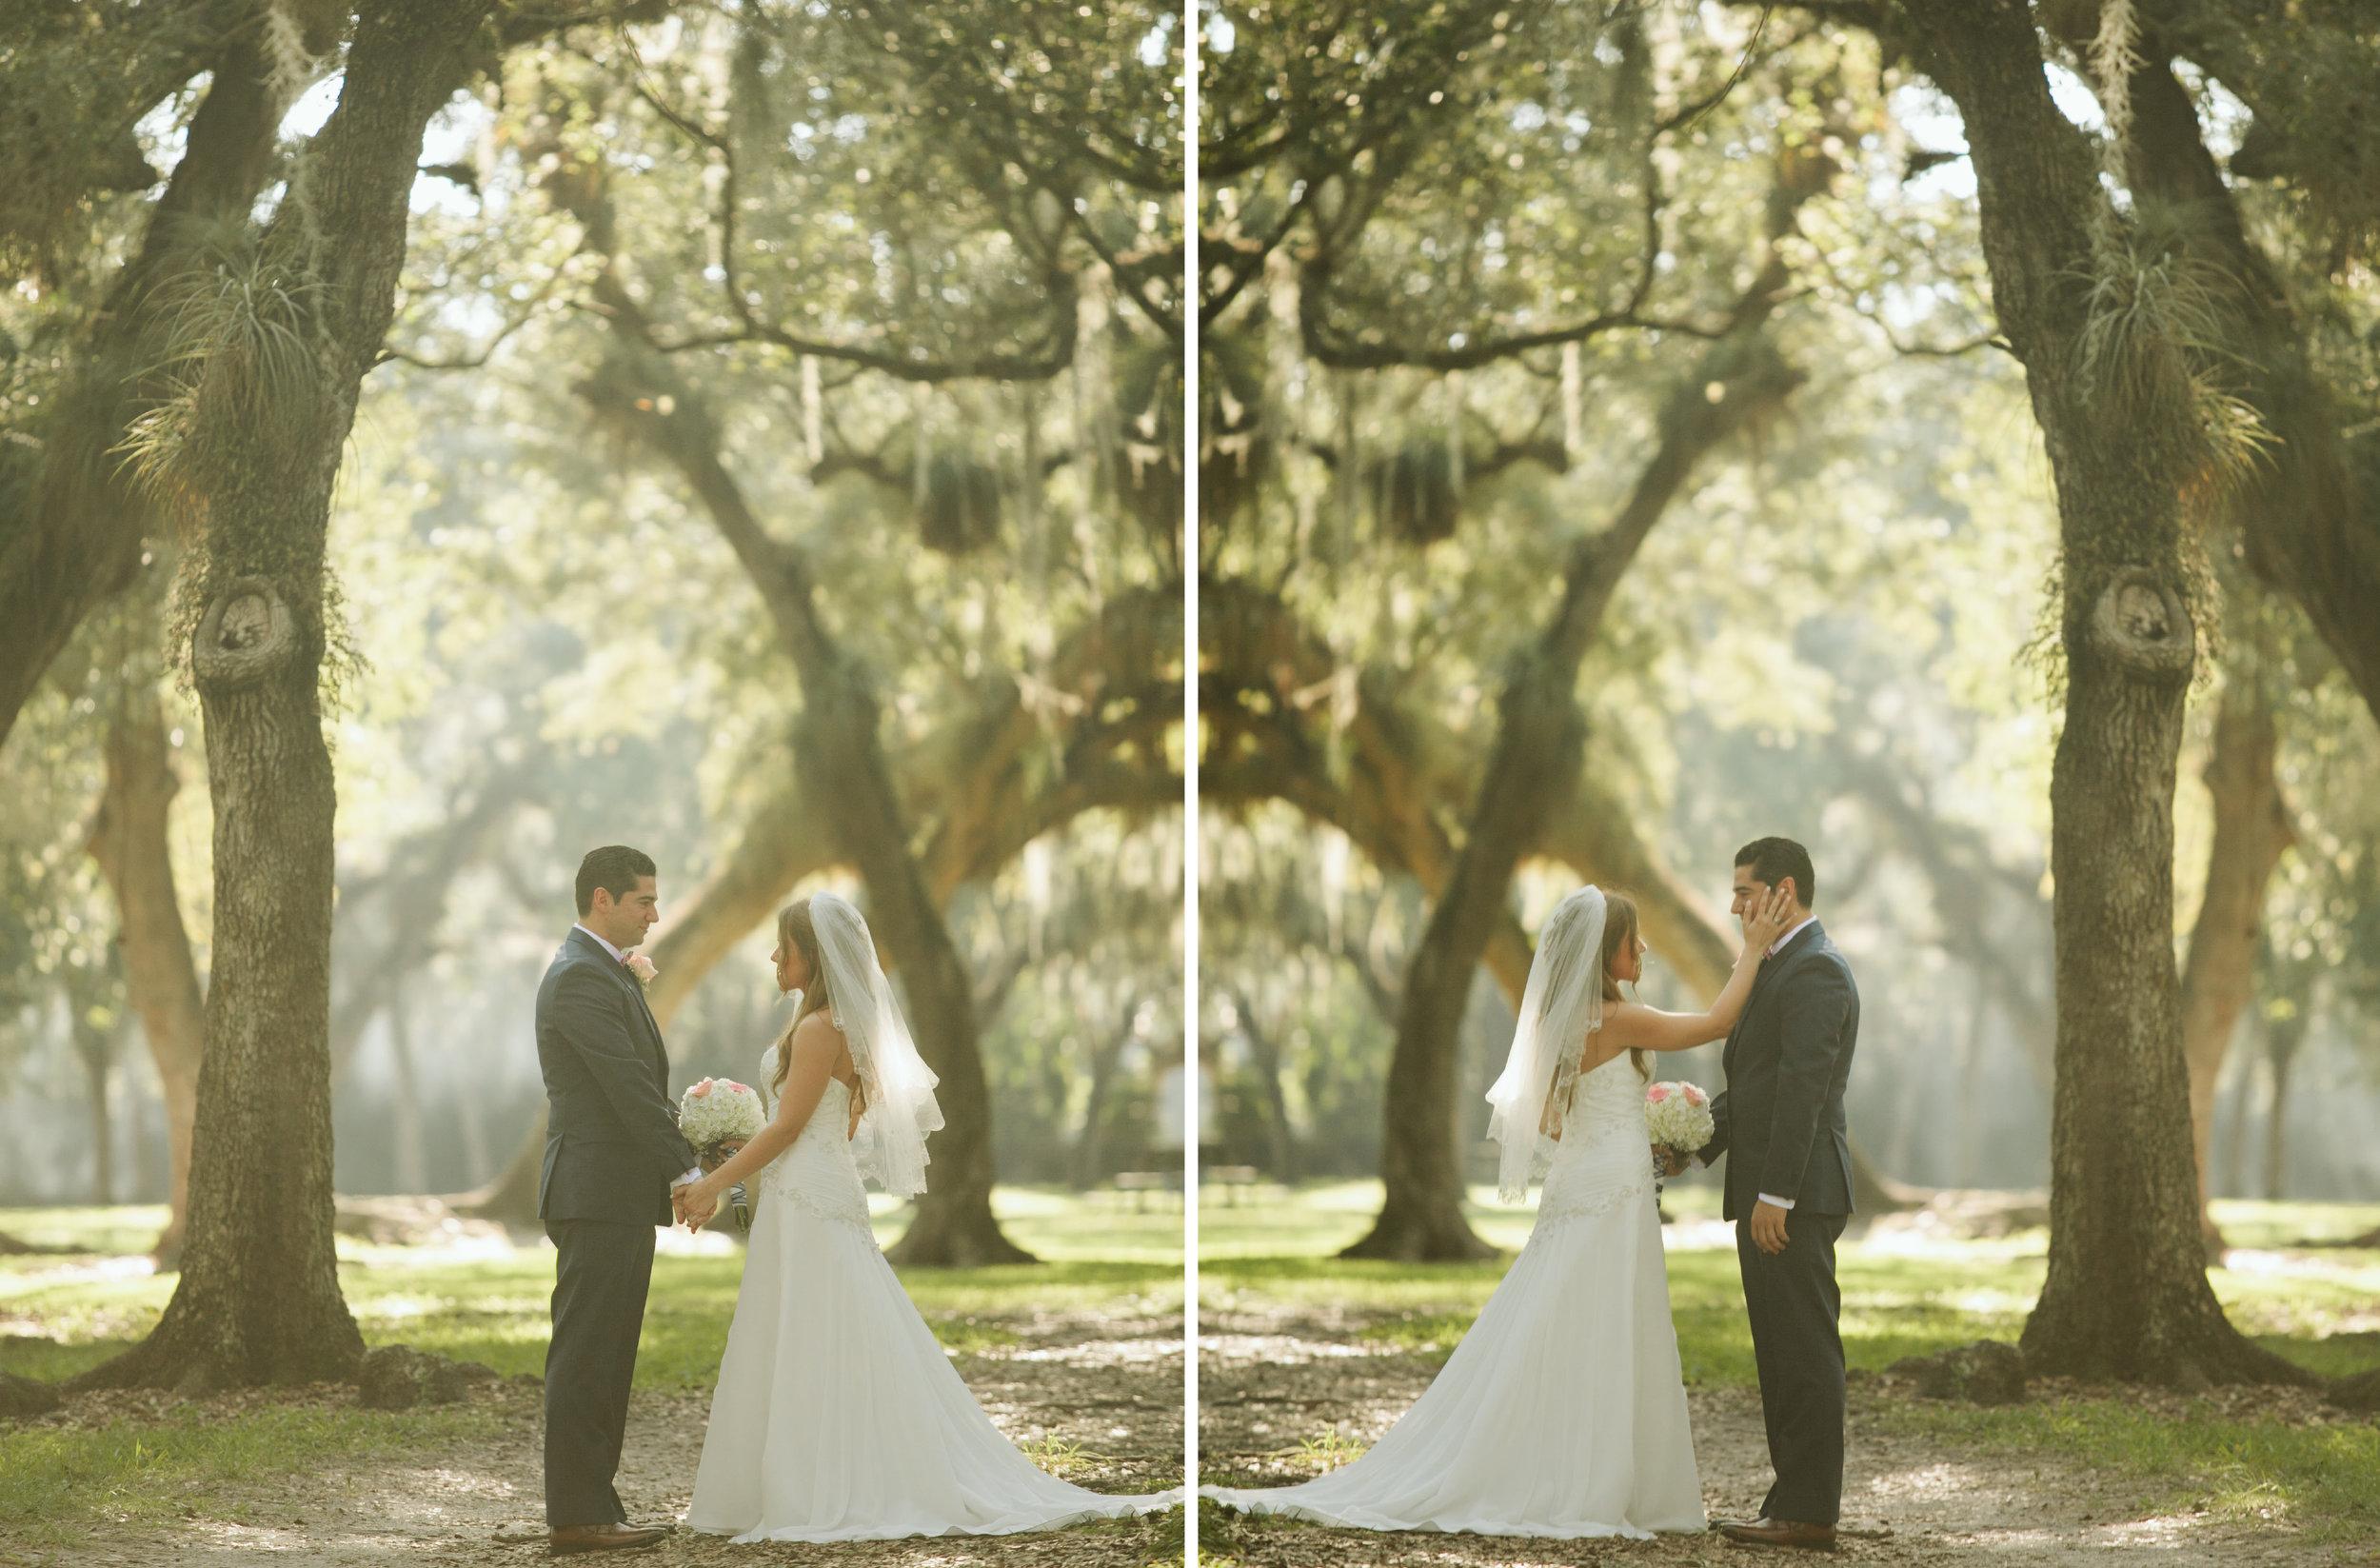 Karen + Lester Matheson Hammock Park Wedding26.jpg